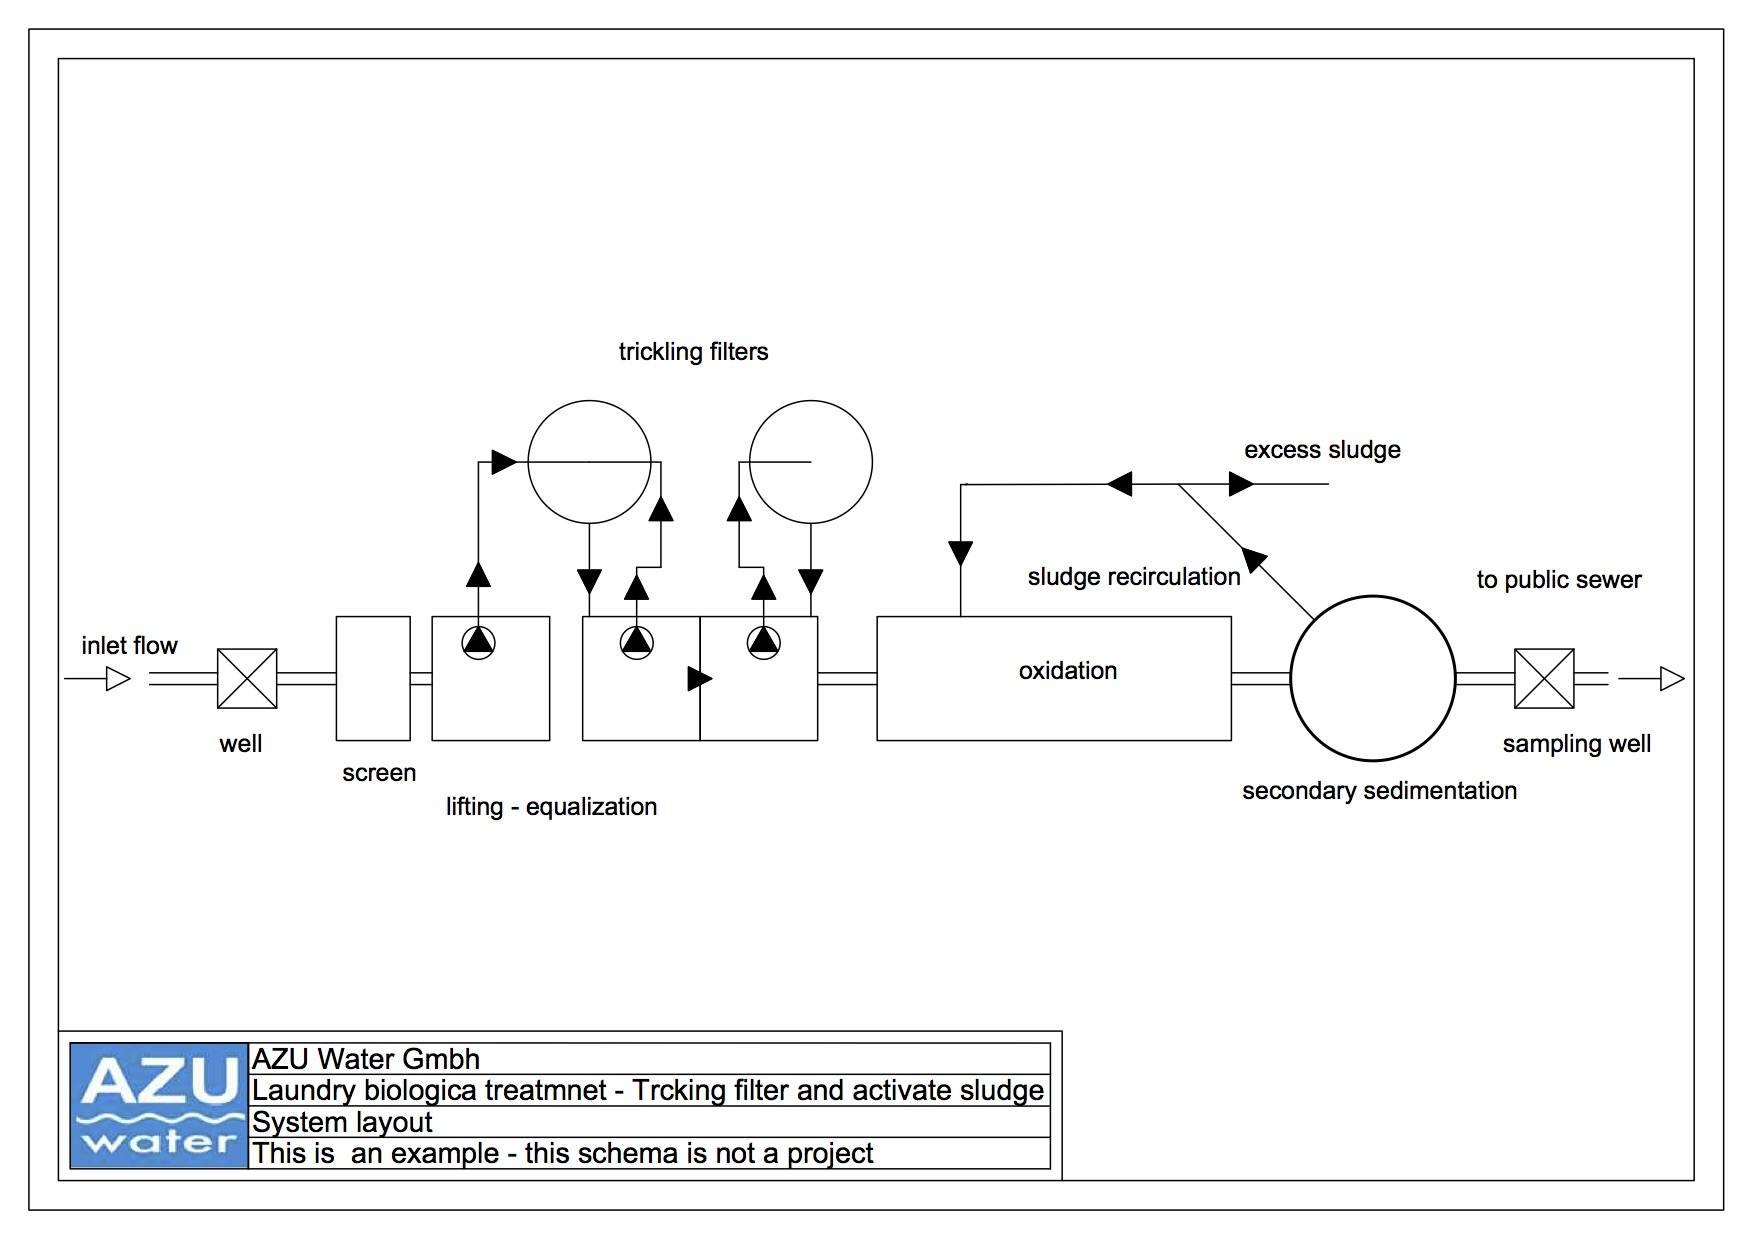 Laundry wastewater treatment plant - AZU Water